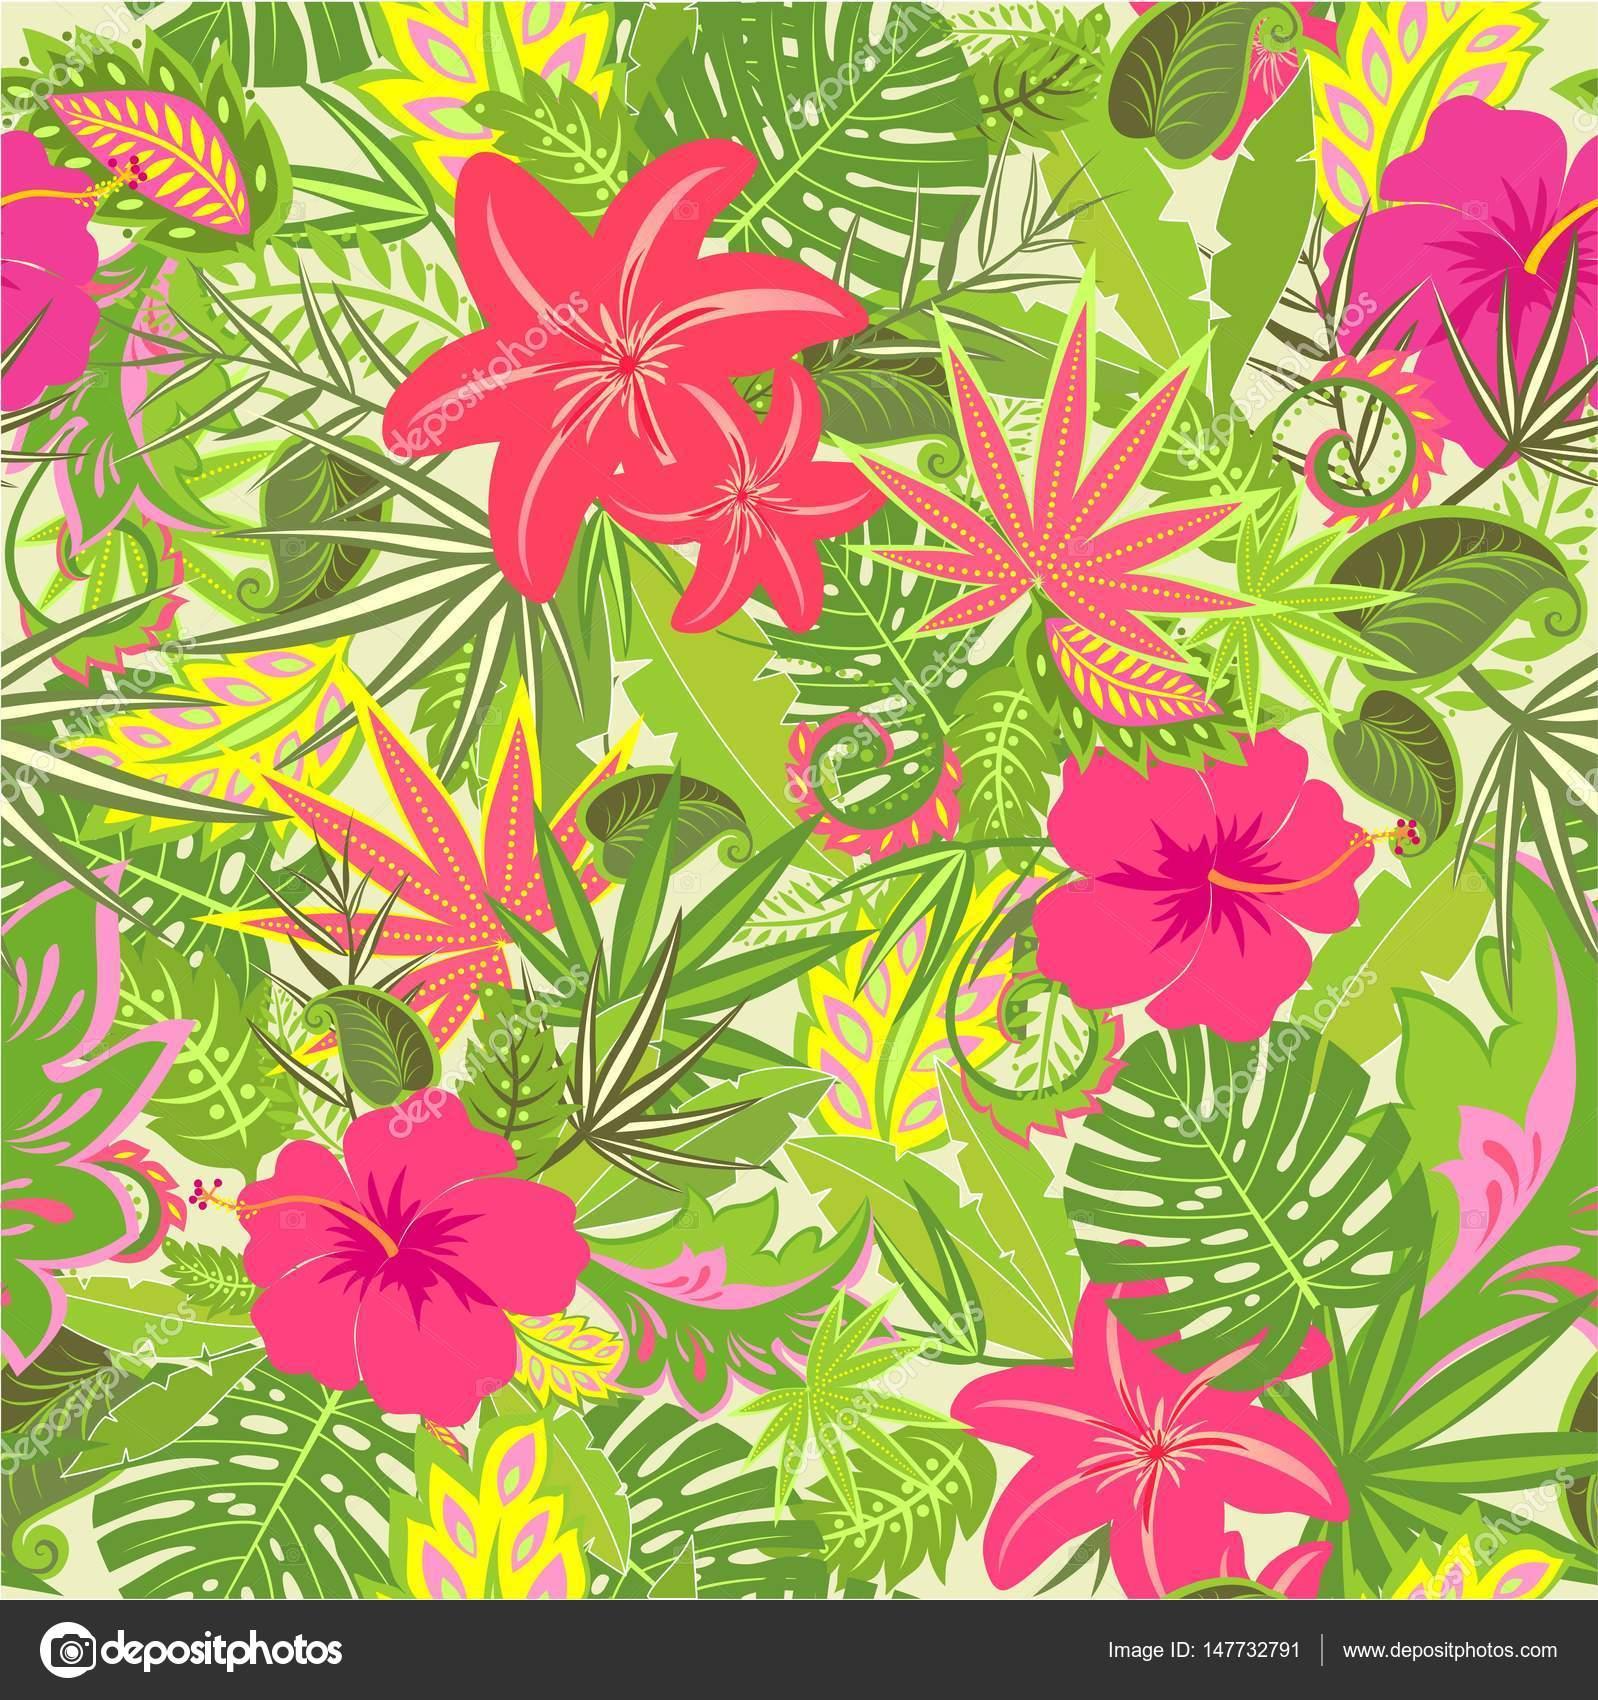 Flowers Fondos Wallpapers Hawaianas Fondo De Pantalla Fondos